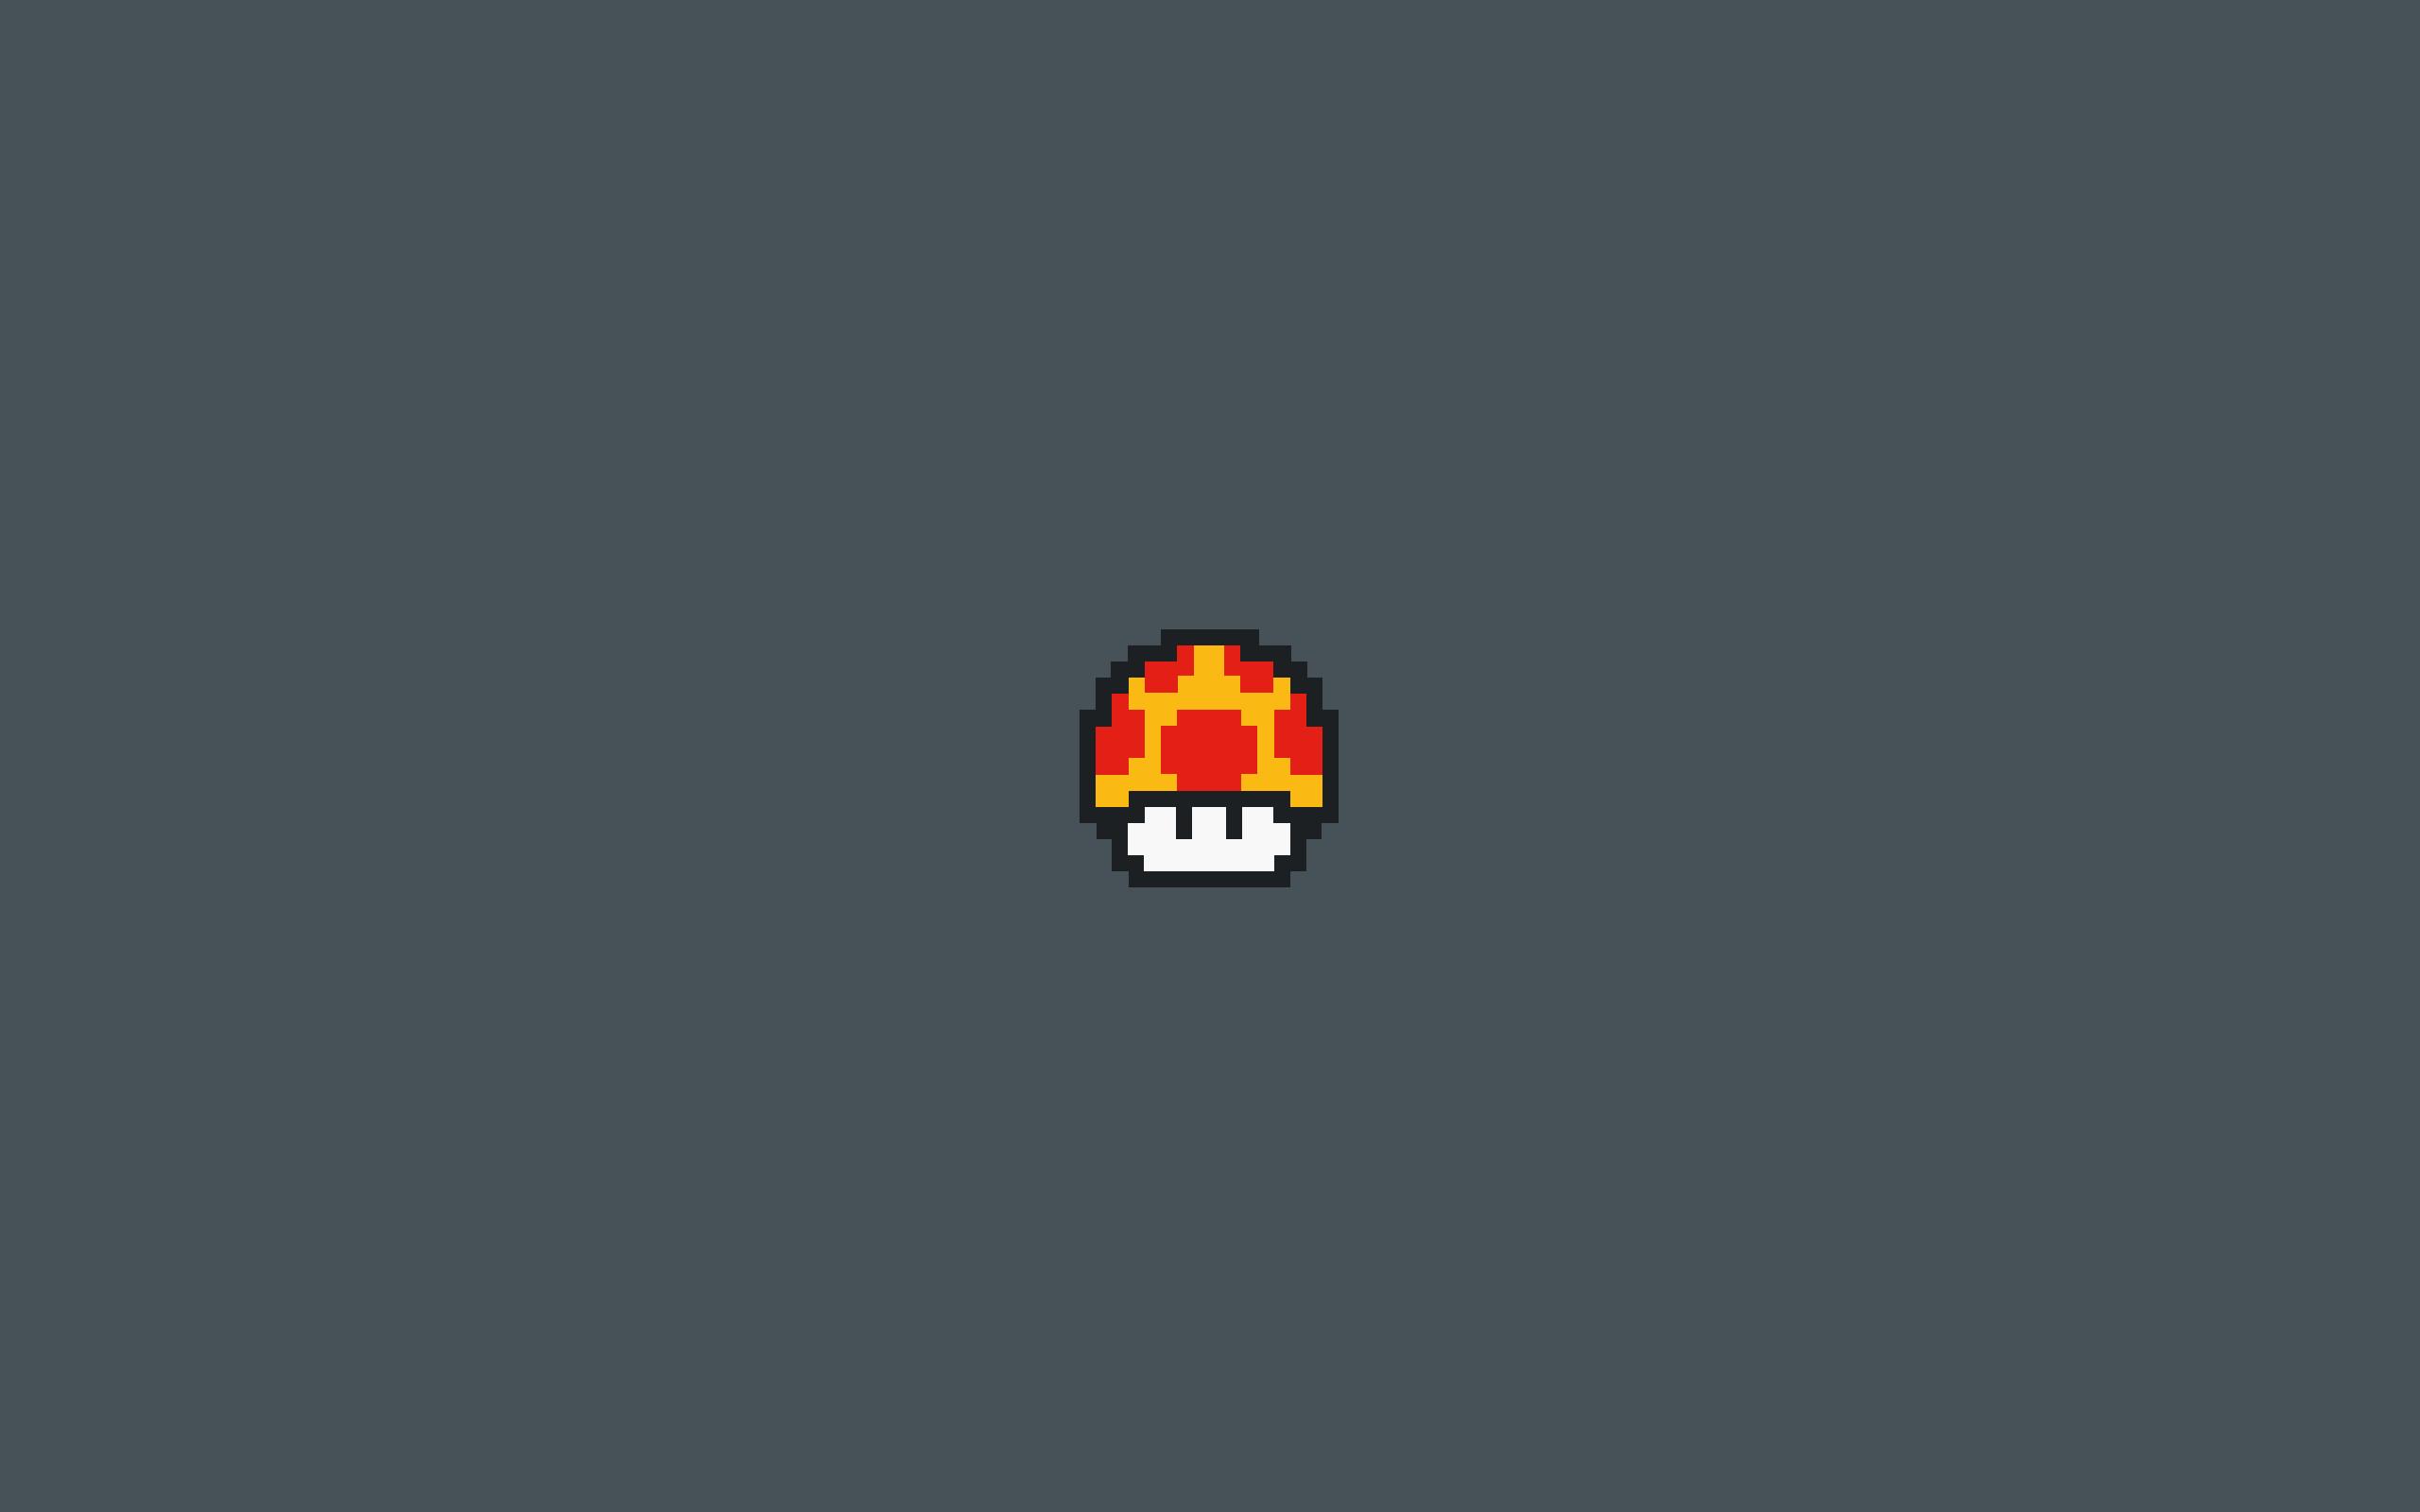 8-Bit Mushroom Desktop Background from Mario.